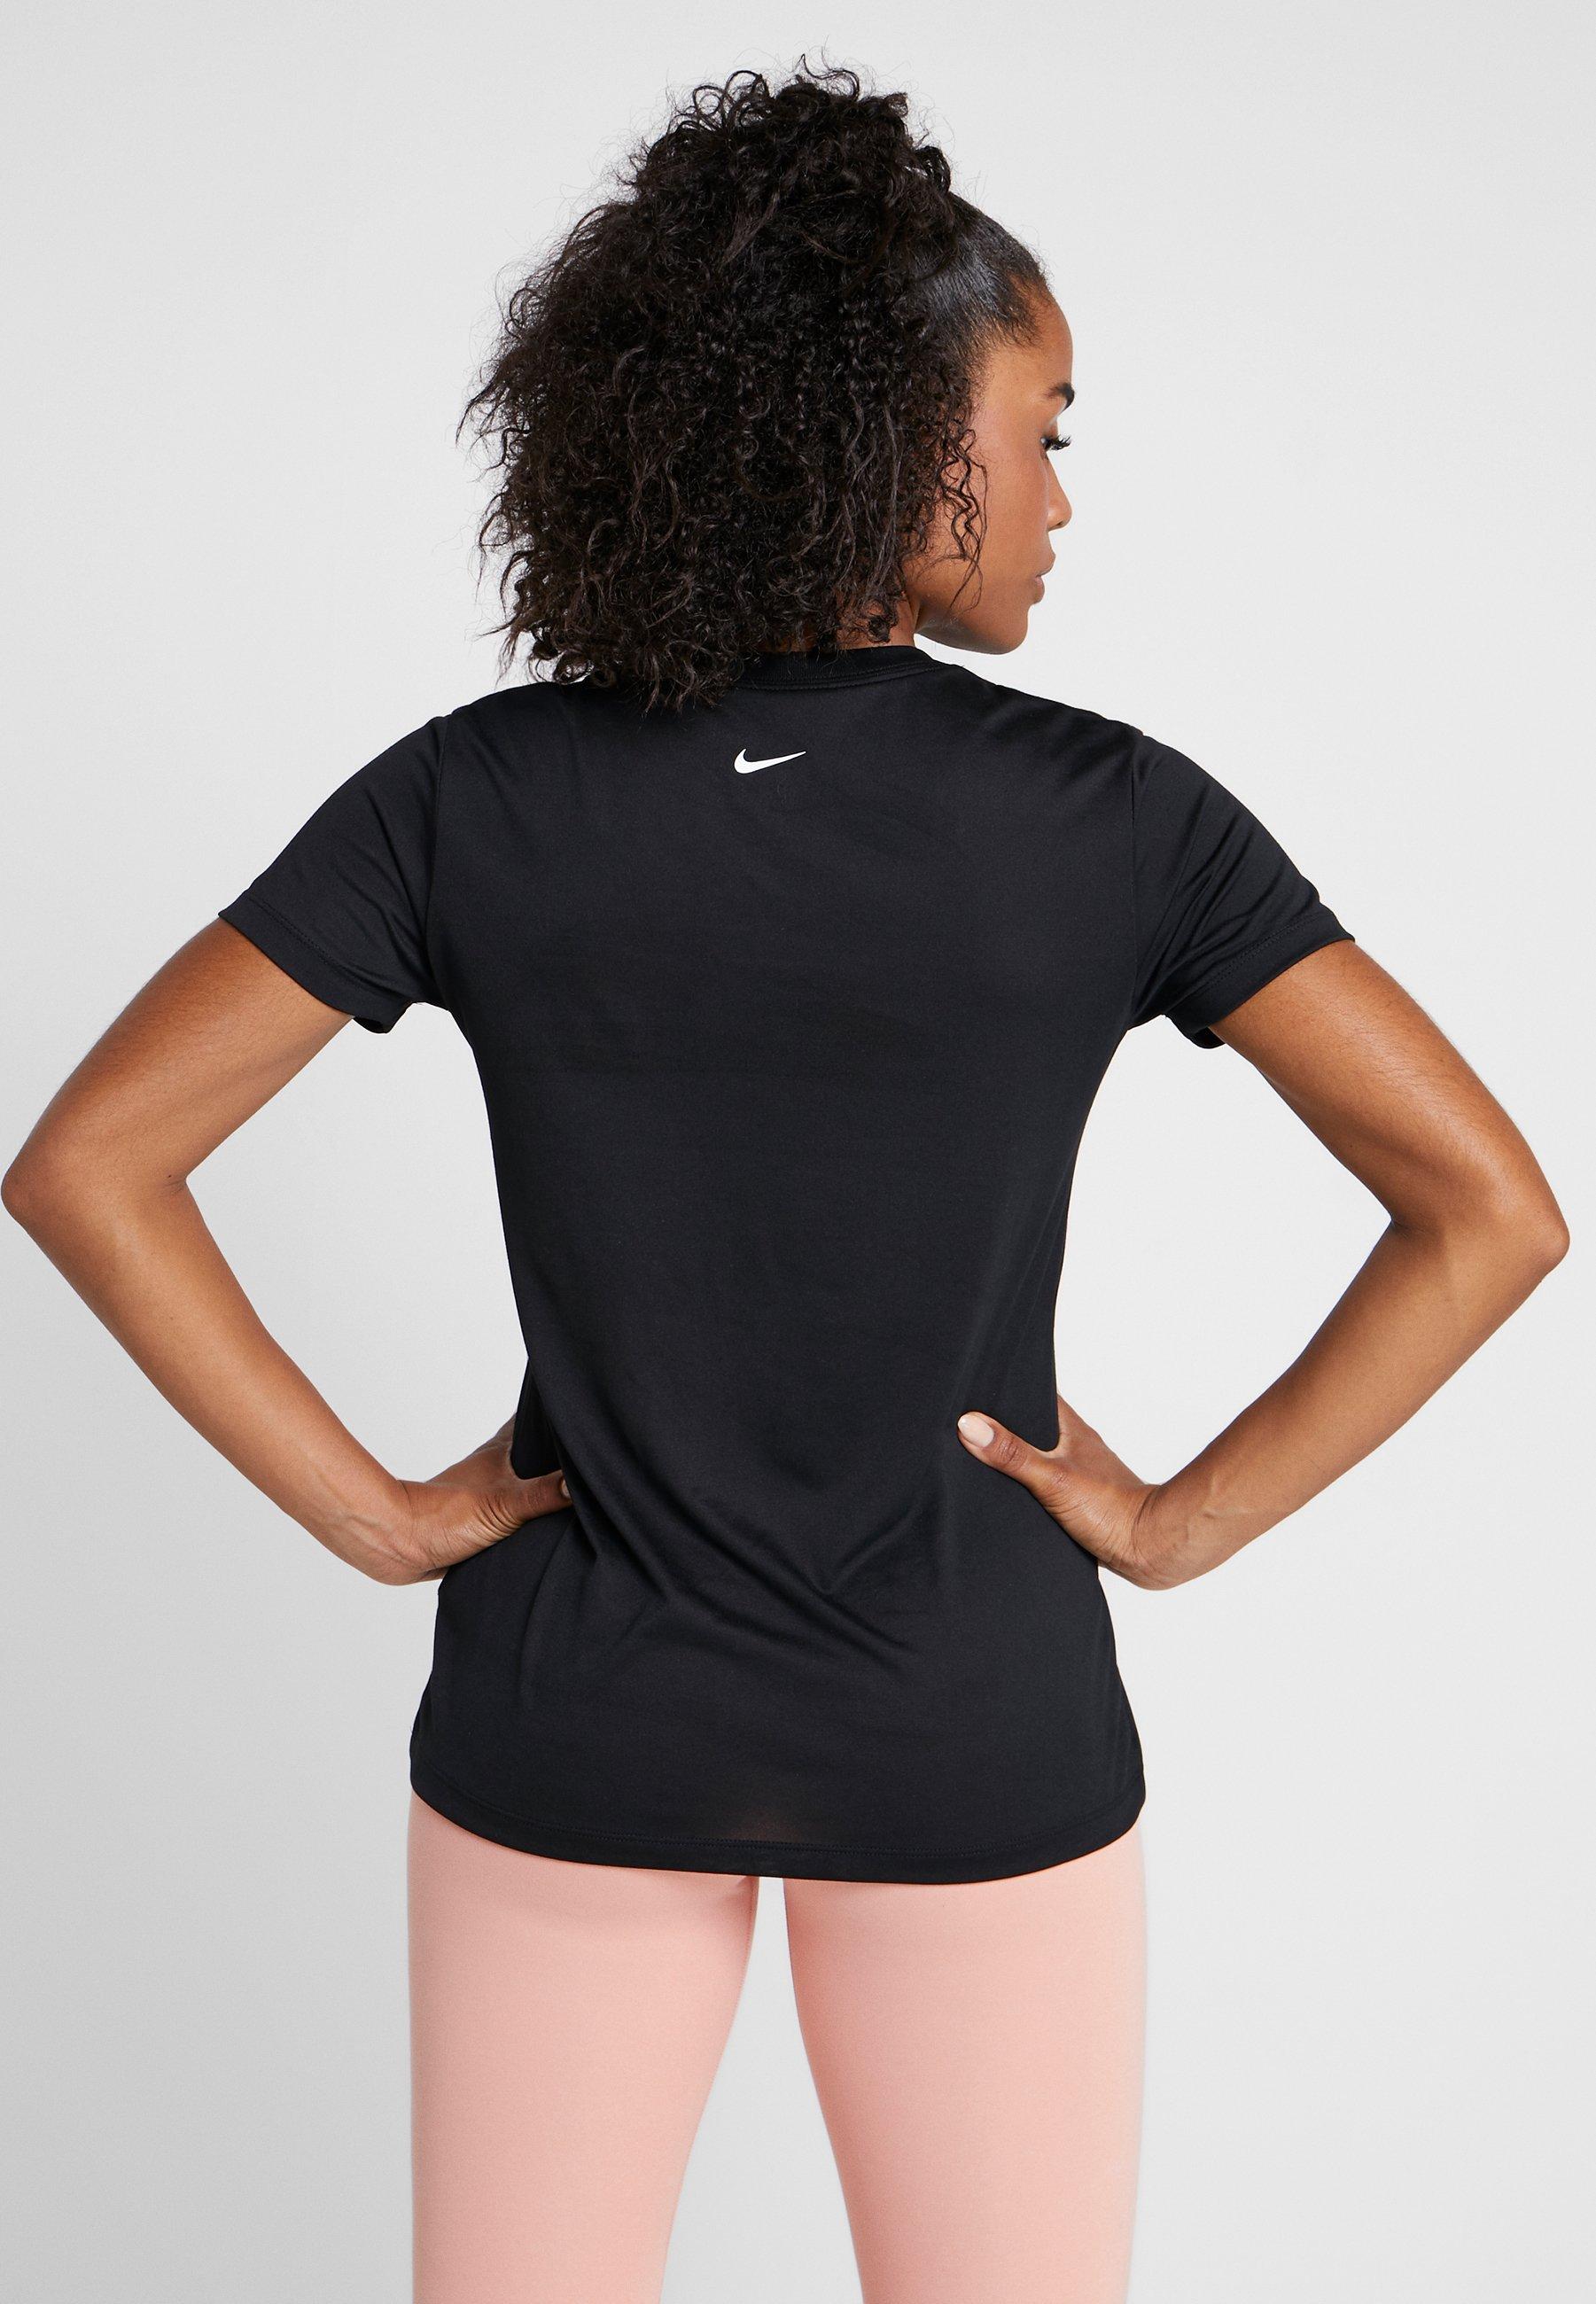 shirt Dry CrewT Rebel Imprimé Nike Performance Tee Black white Leg GpzqSUMV